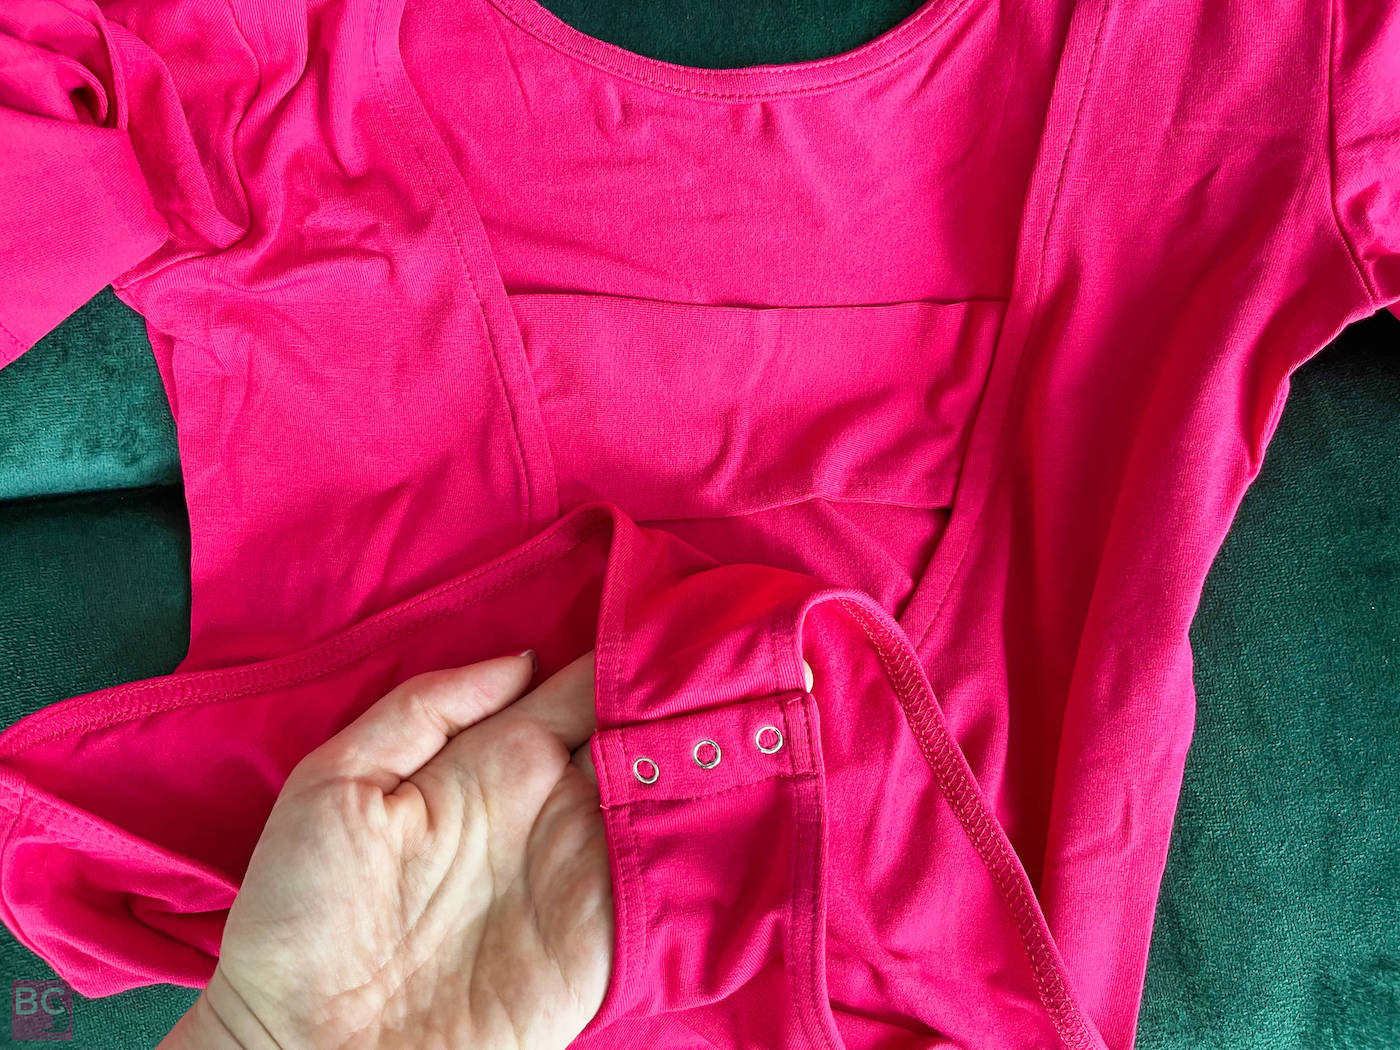 Schritt Verschluss The Charlotte Bodysuit Les Lunes Erfahrungen Größe Farbe rot